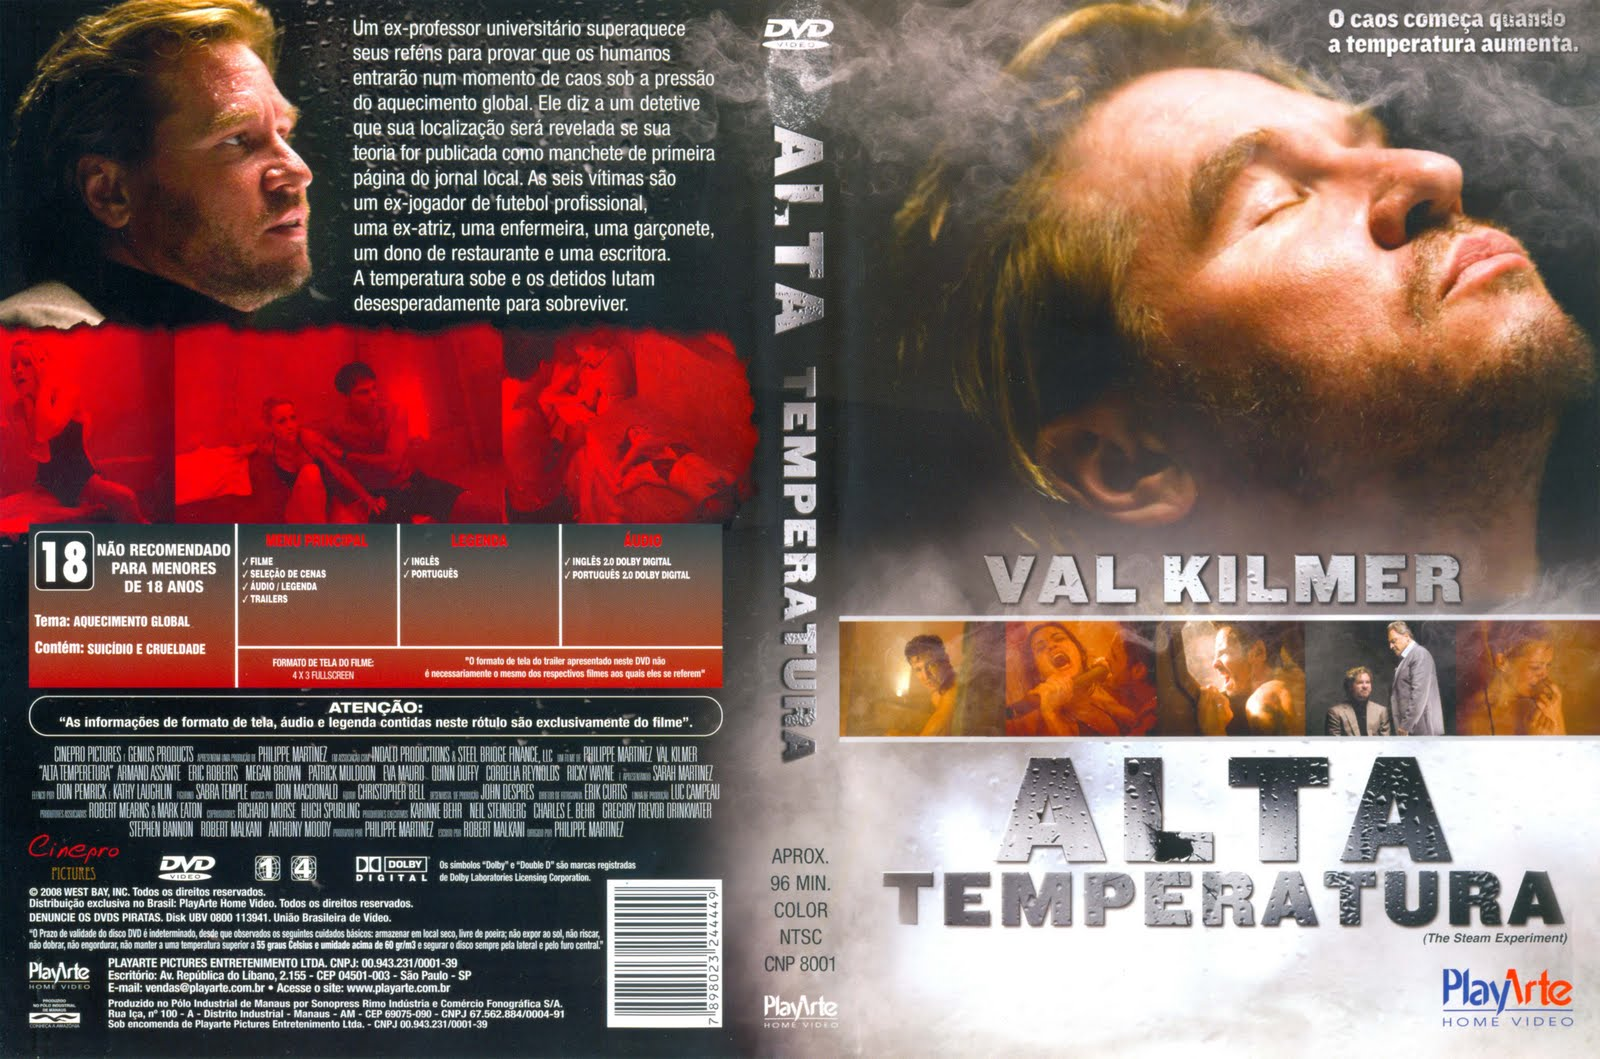 http://2.bp.blogspot.com/_56N_enXK-4o/TDXhgLaq8ZI/AAAAAAAAACk/dXSpmat7Eo8/s1600/Alta_Temperatura.jpg